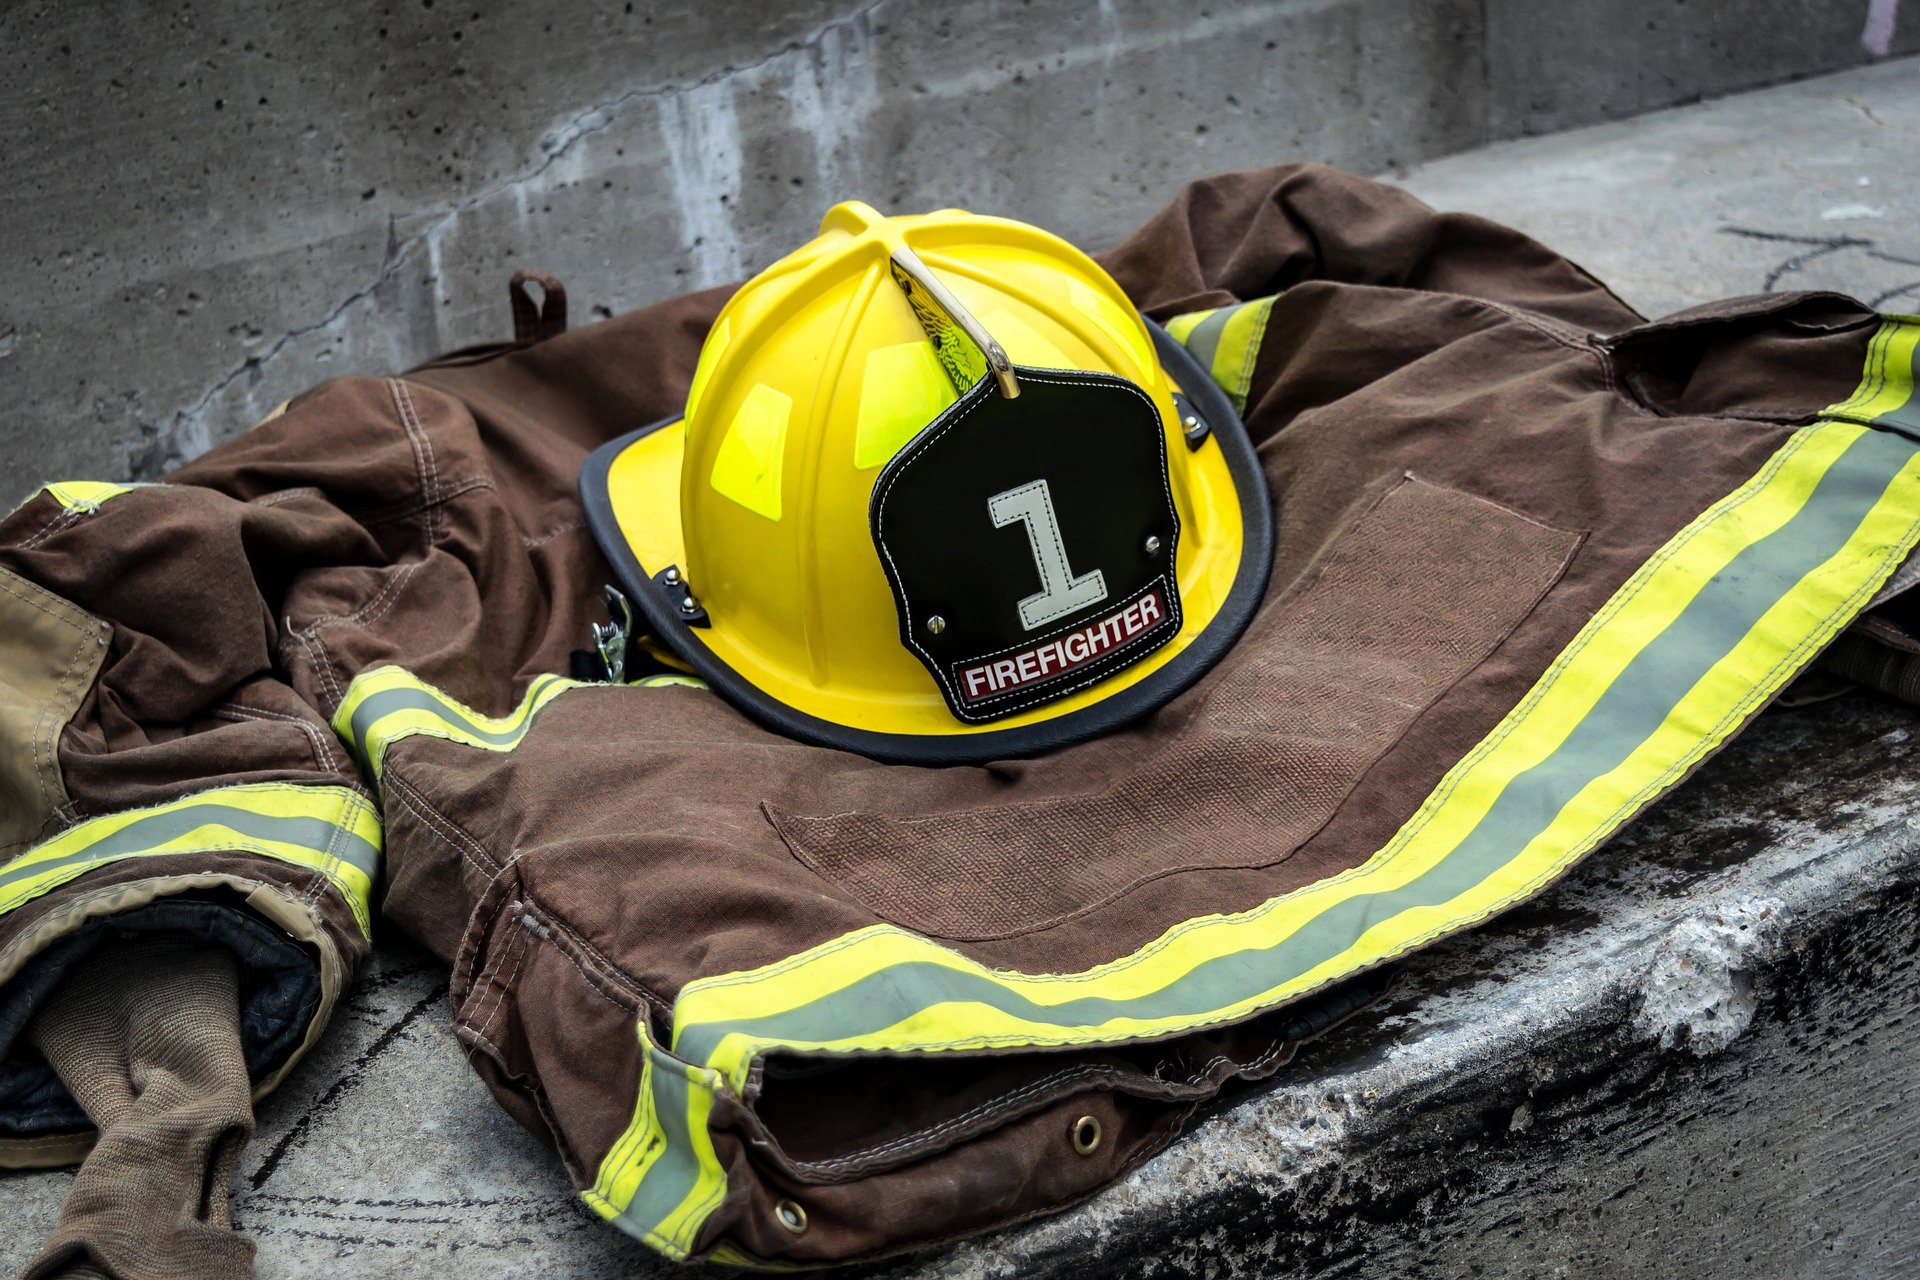 bombero, ropa, trabajo, héroe, uniforme - Fondos de Pantalla HD - professor-falken.com